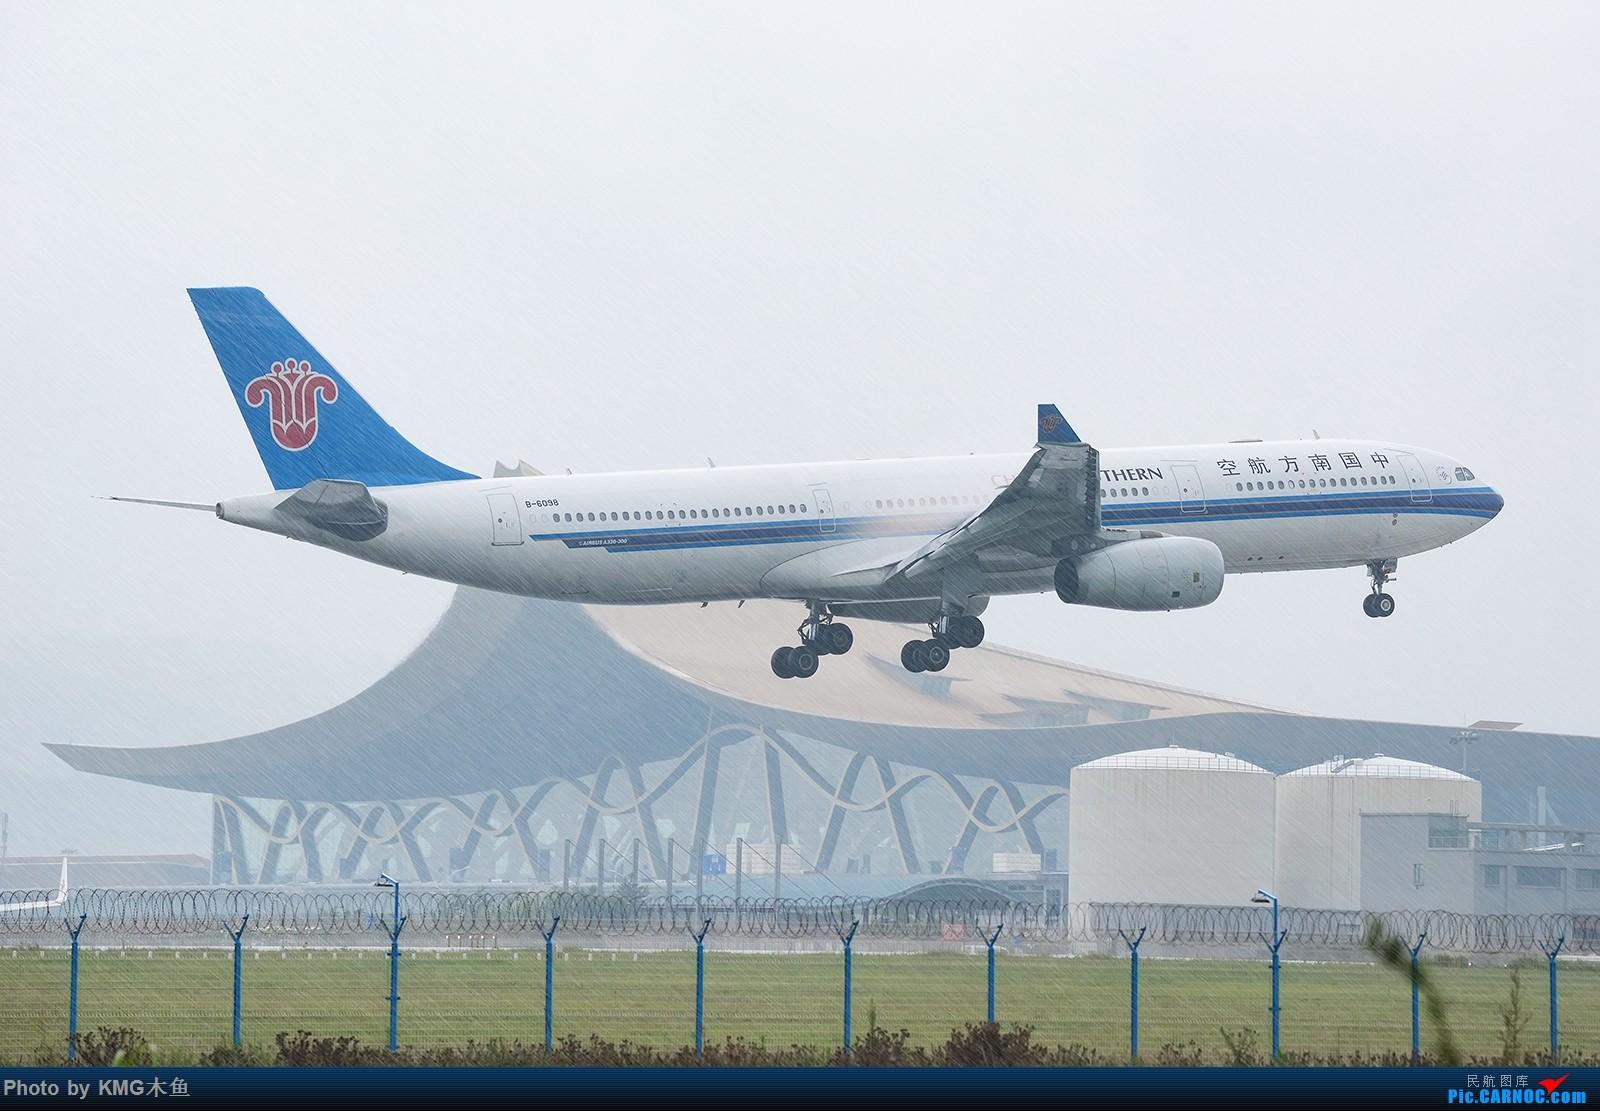 Re:[原创]【昆明长水国际机场——KMG木鱼拍机】昆明接二连三的阴雨天,形成了好货烂天有,烂天必有好货的奇特现象 AIRBUS A330-300 B-6098 中国昆明长水国际机场